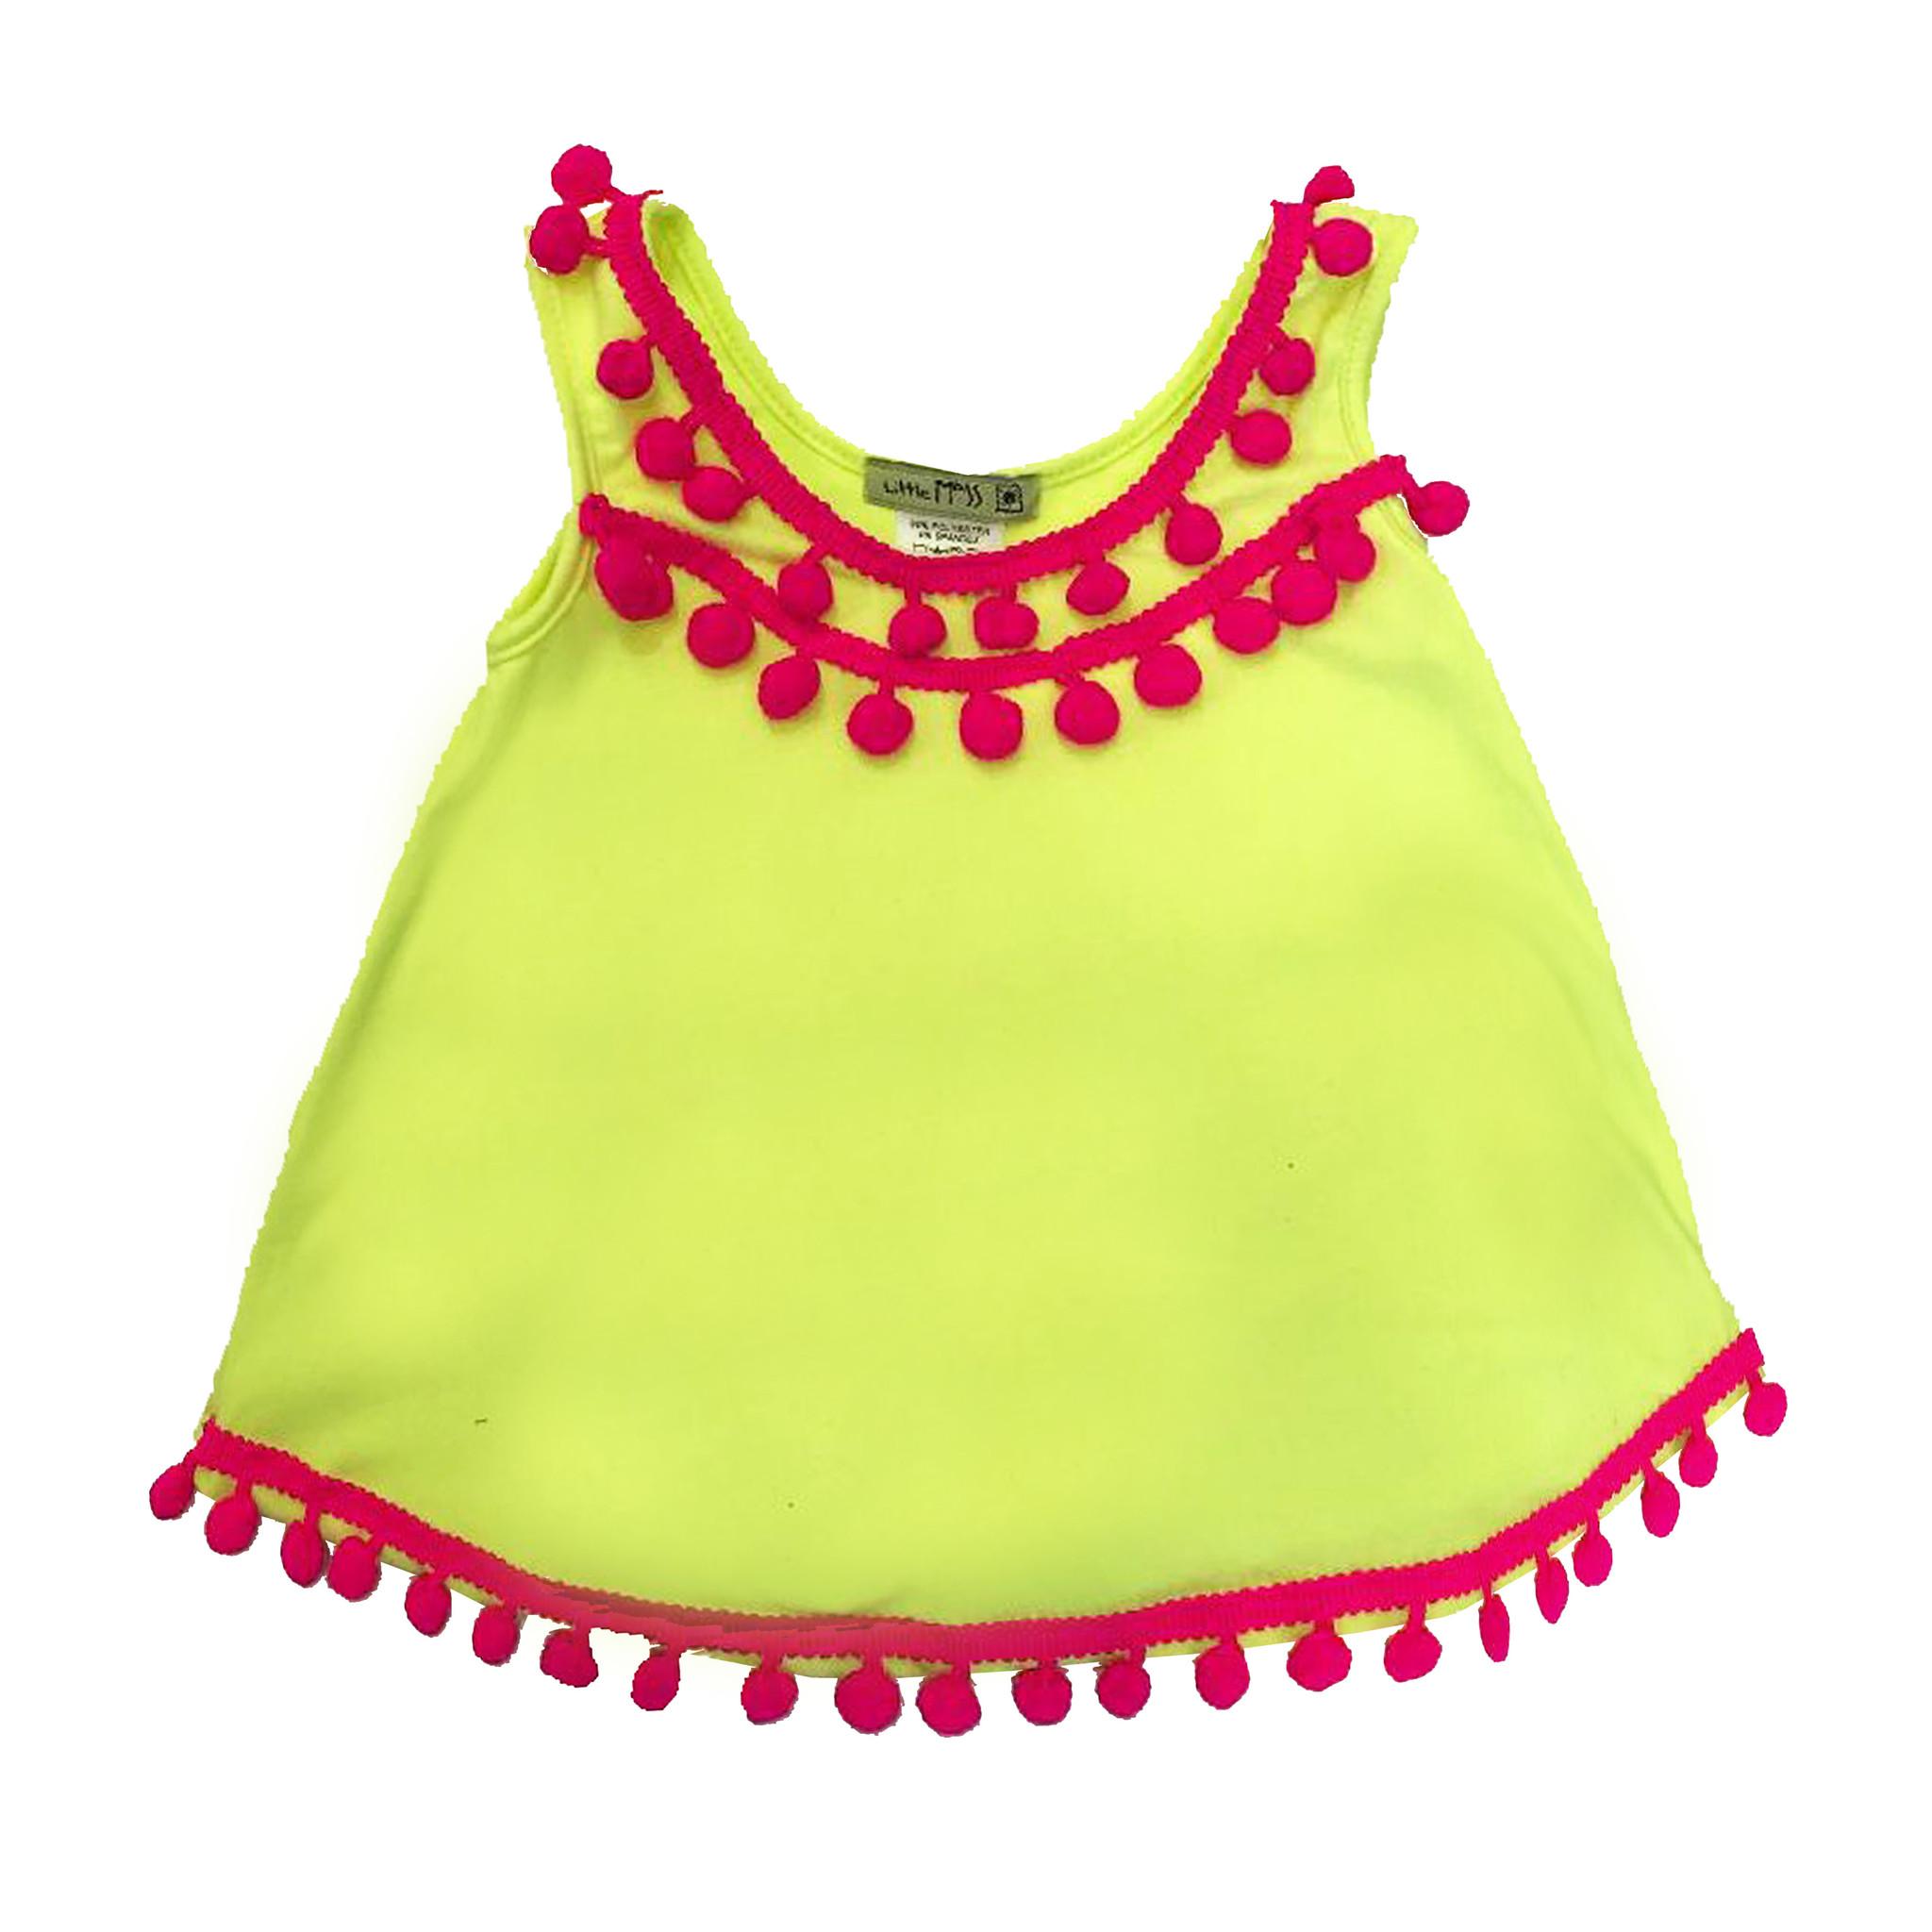 Little Mass Neon Yellow Pom Pom Swing Tank